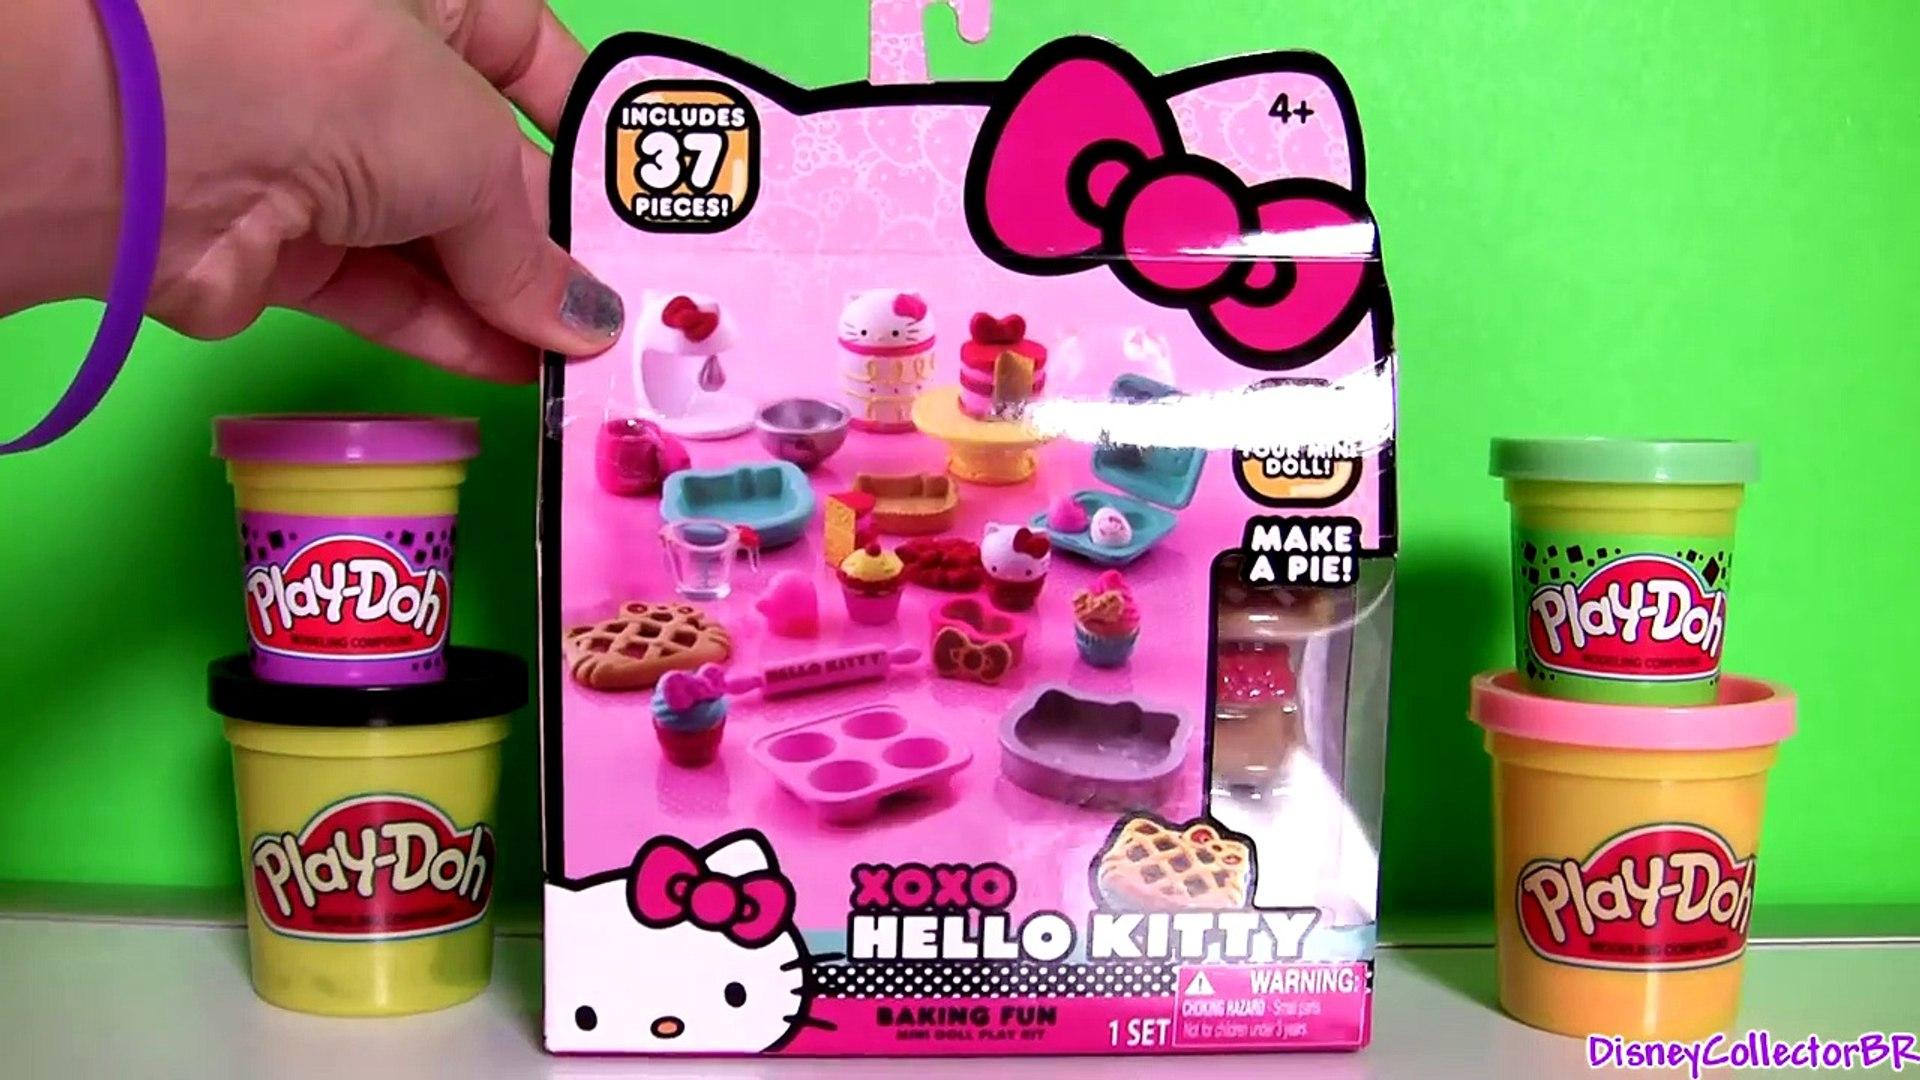 Play Doh Hello Kitty Xoxo Baking Fun Set Donuts Patisserie ャラクター練り切り Ïローキティ Kitchen Baking Toy Video Dailymotion